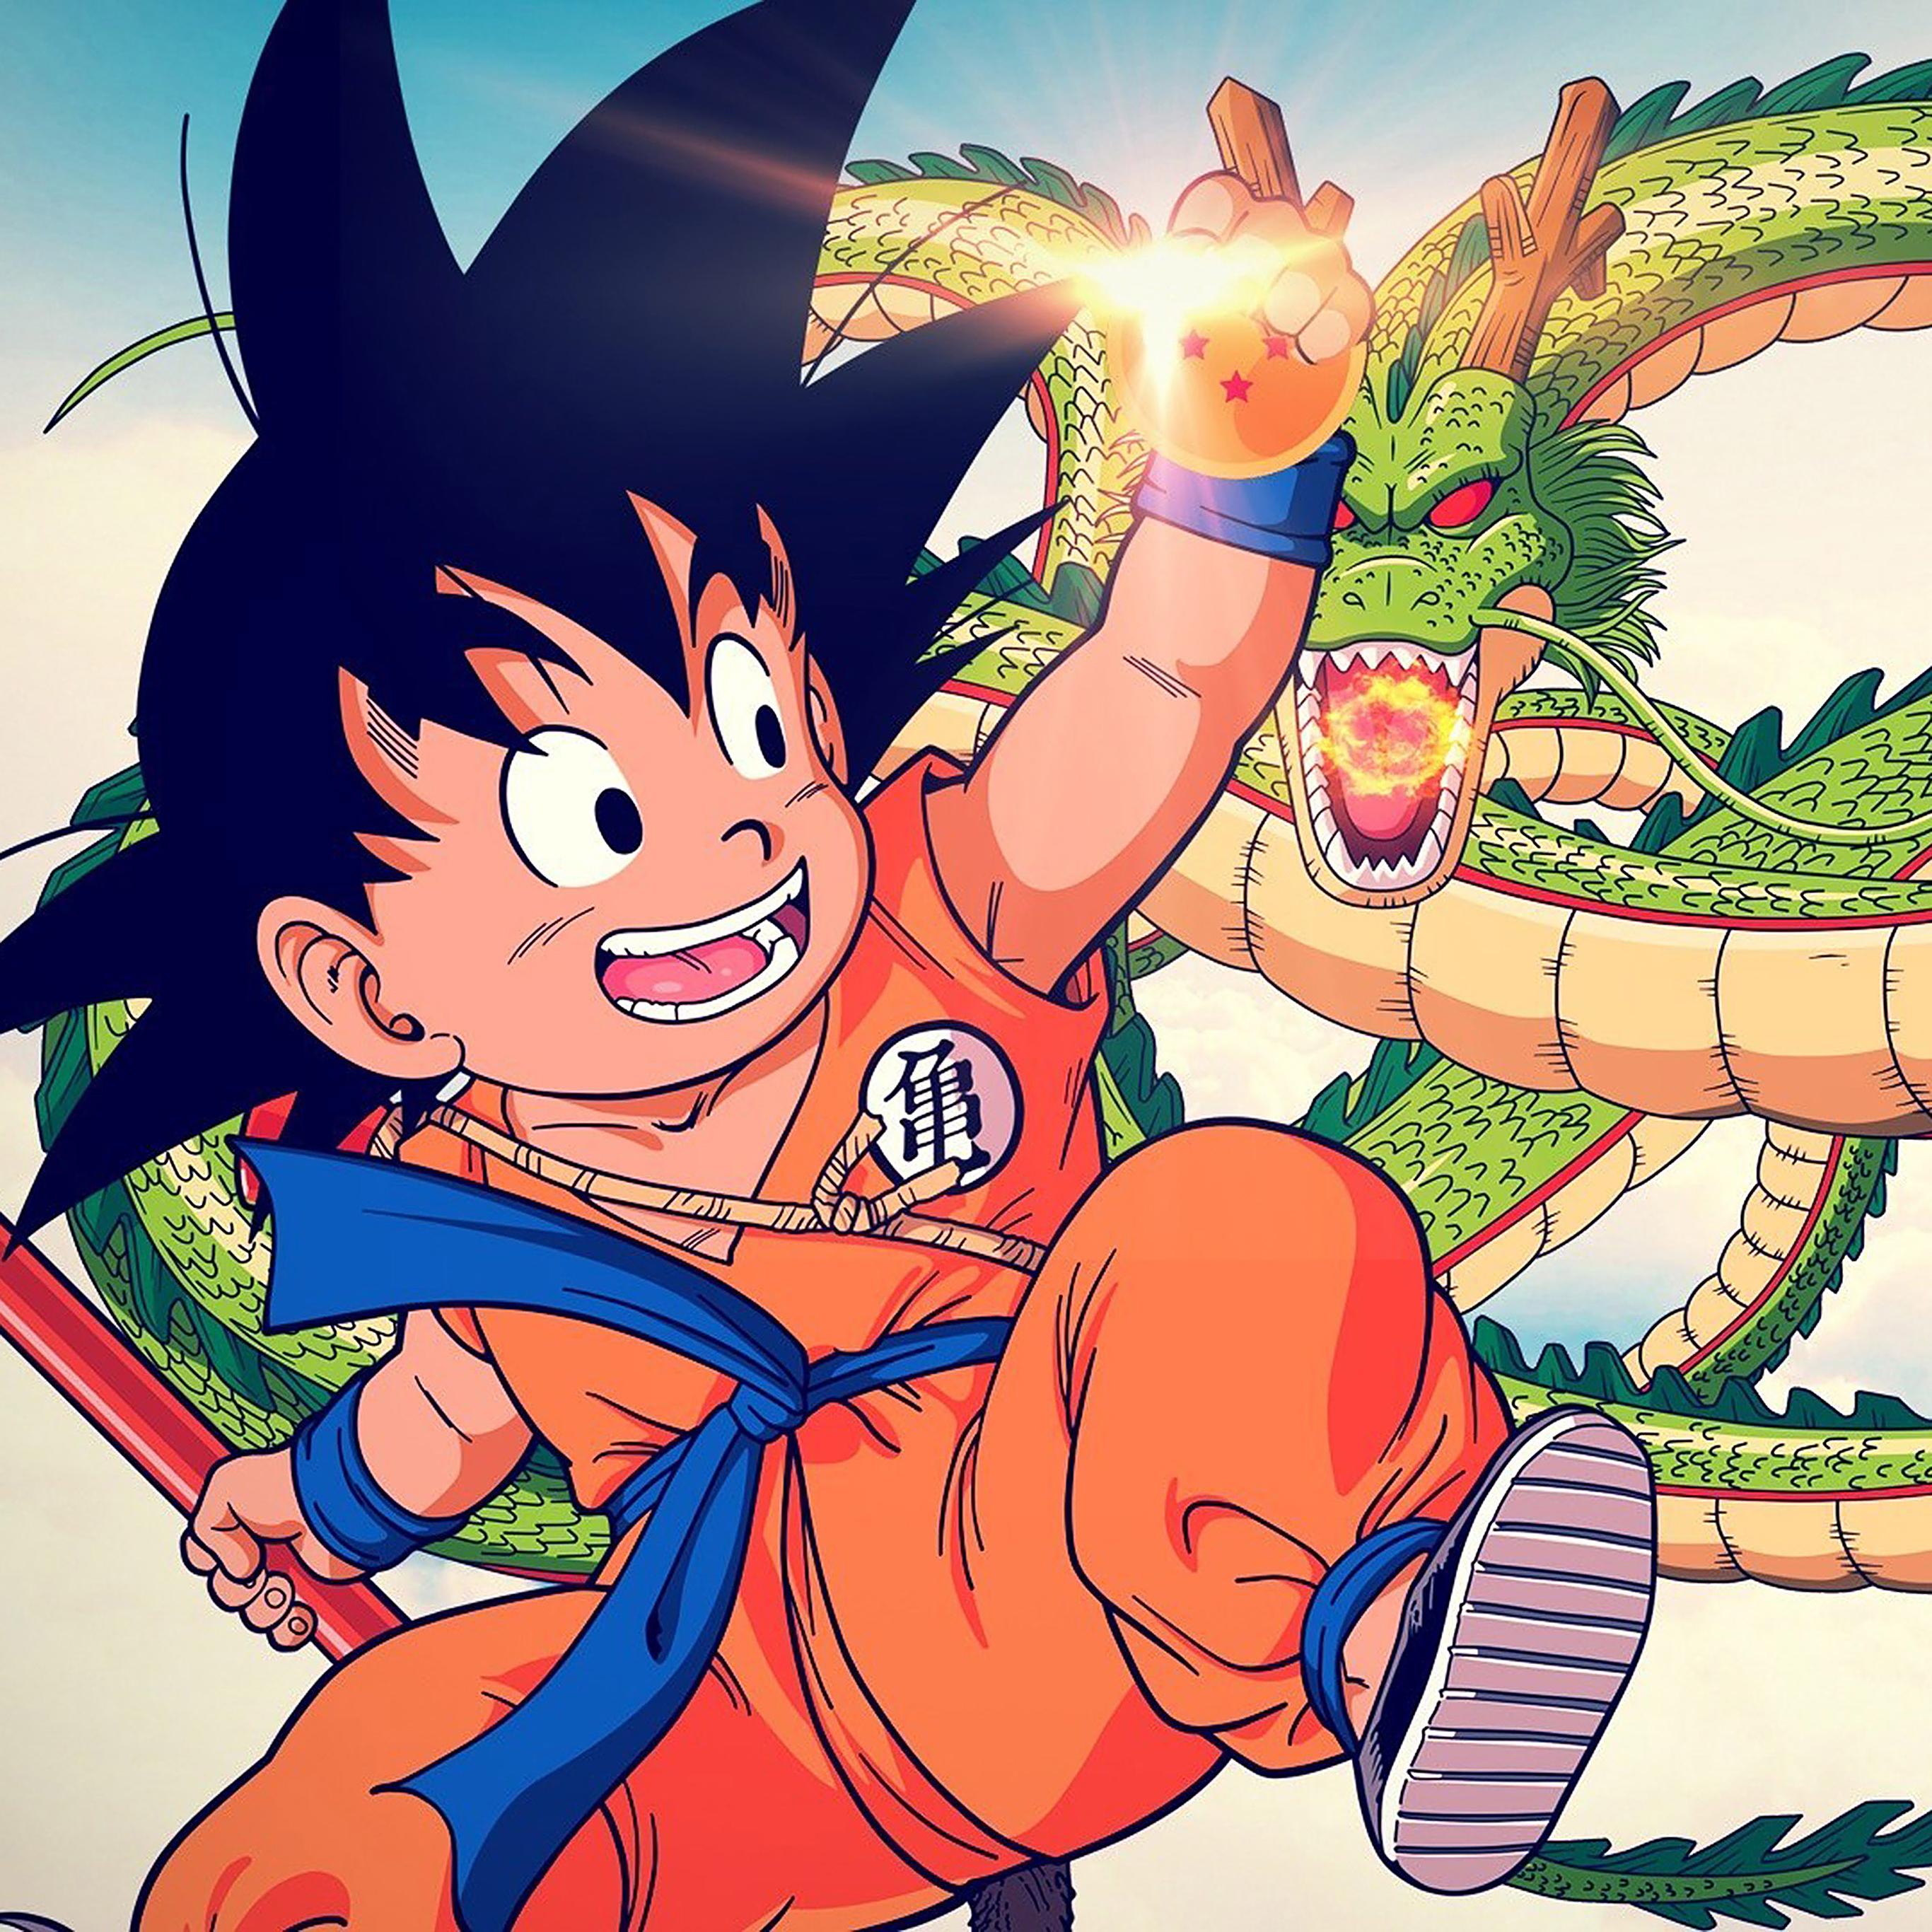 Ab04 Wallpaper Goku Kid Dragonball Illust Papers Co